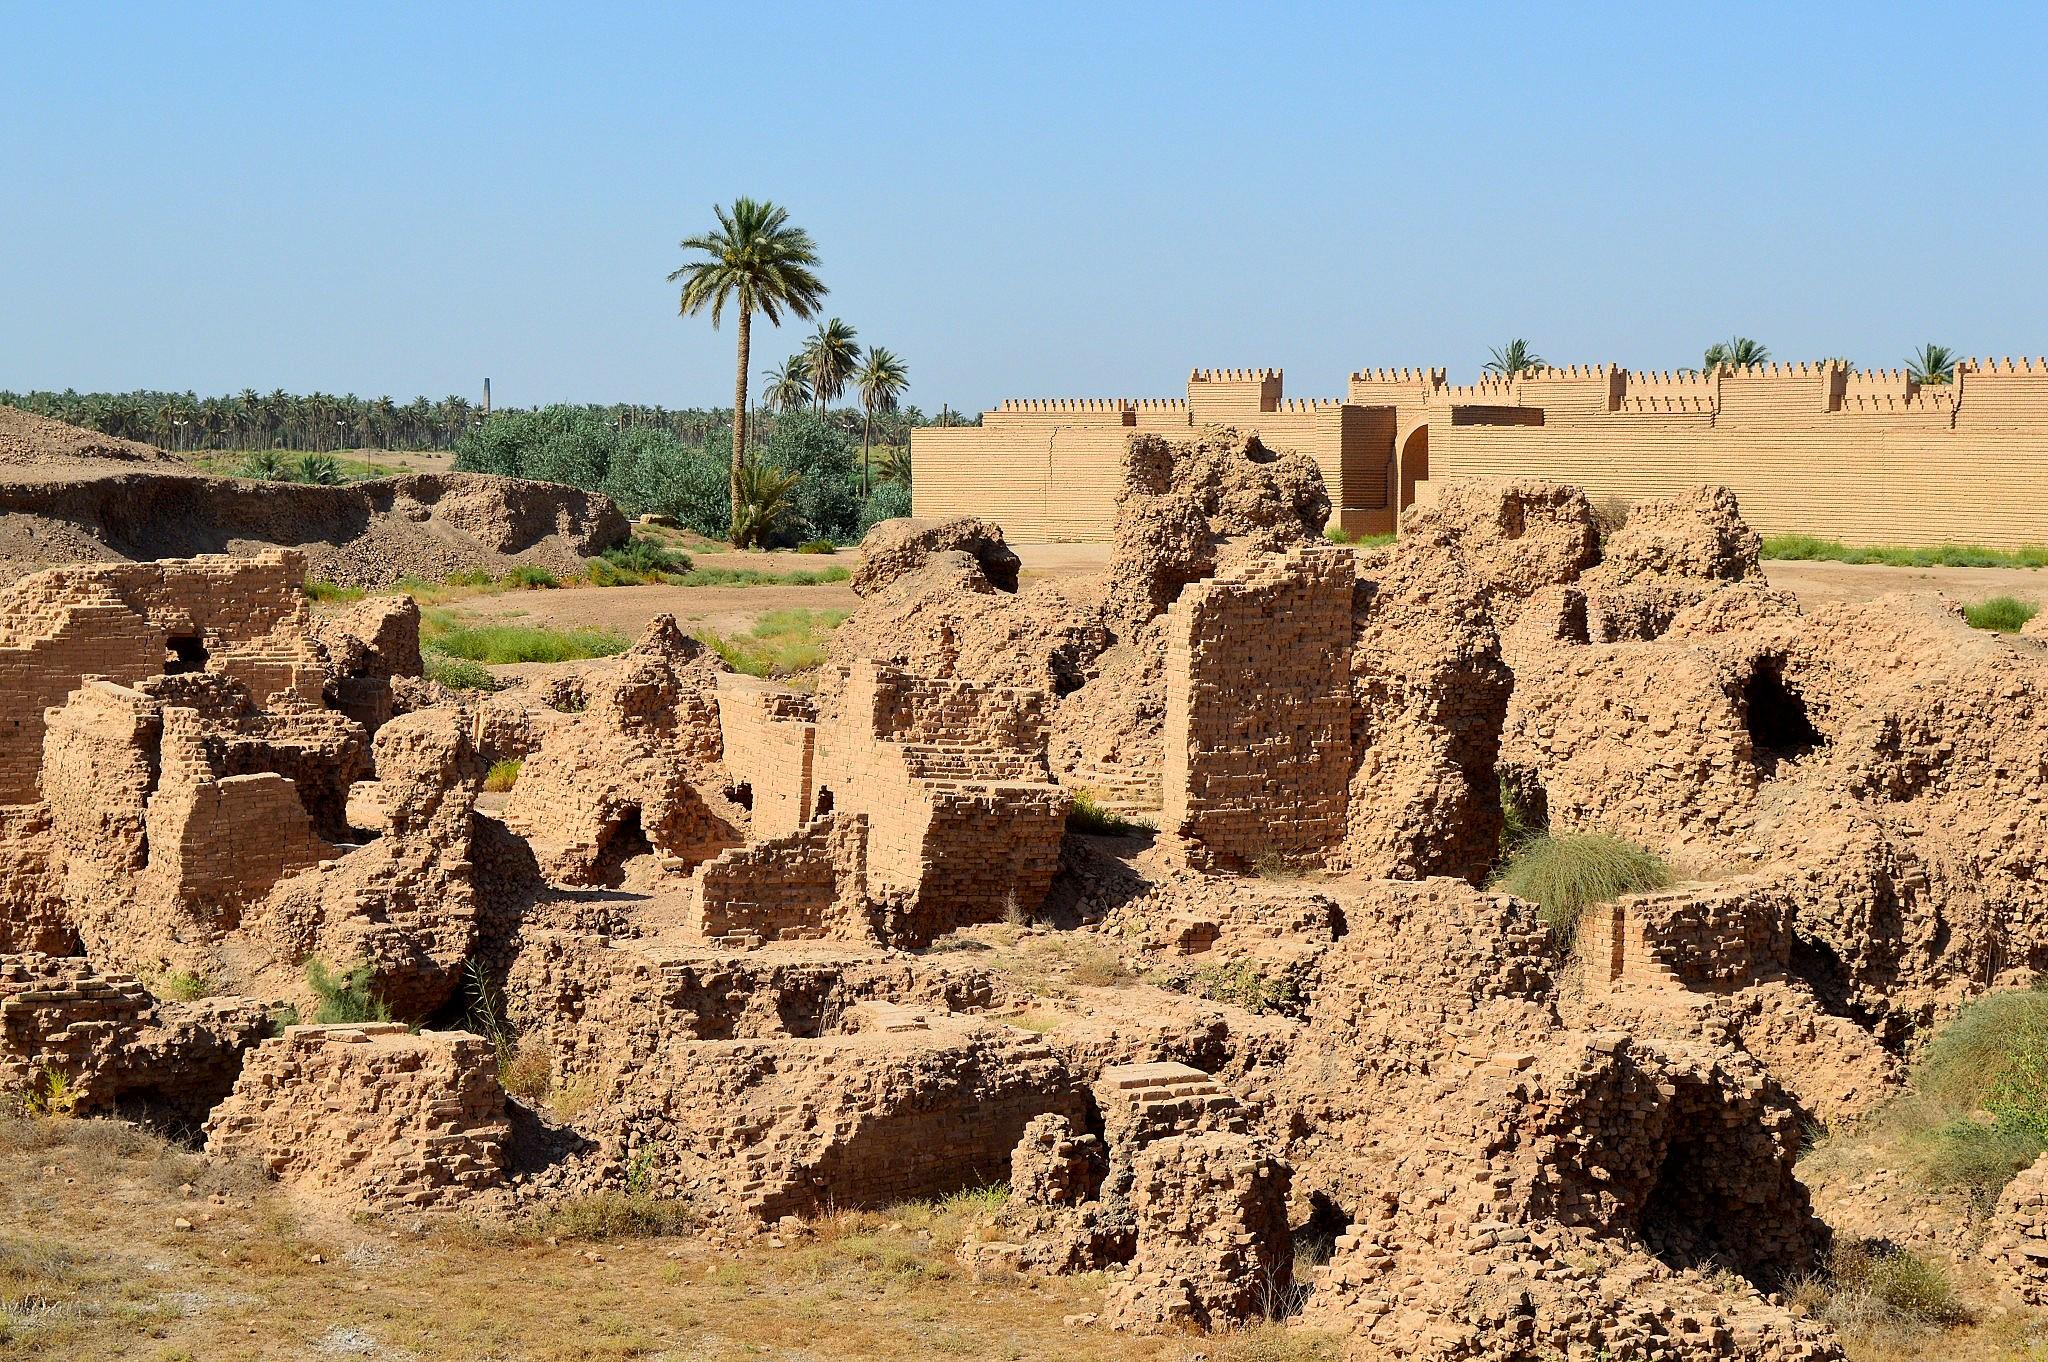 File:Ruins of Babylon, Mesopotamia, Iraq.jpg - Wikimedia Commons